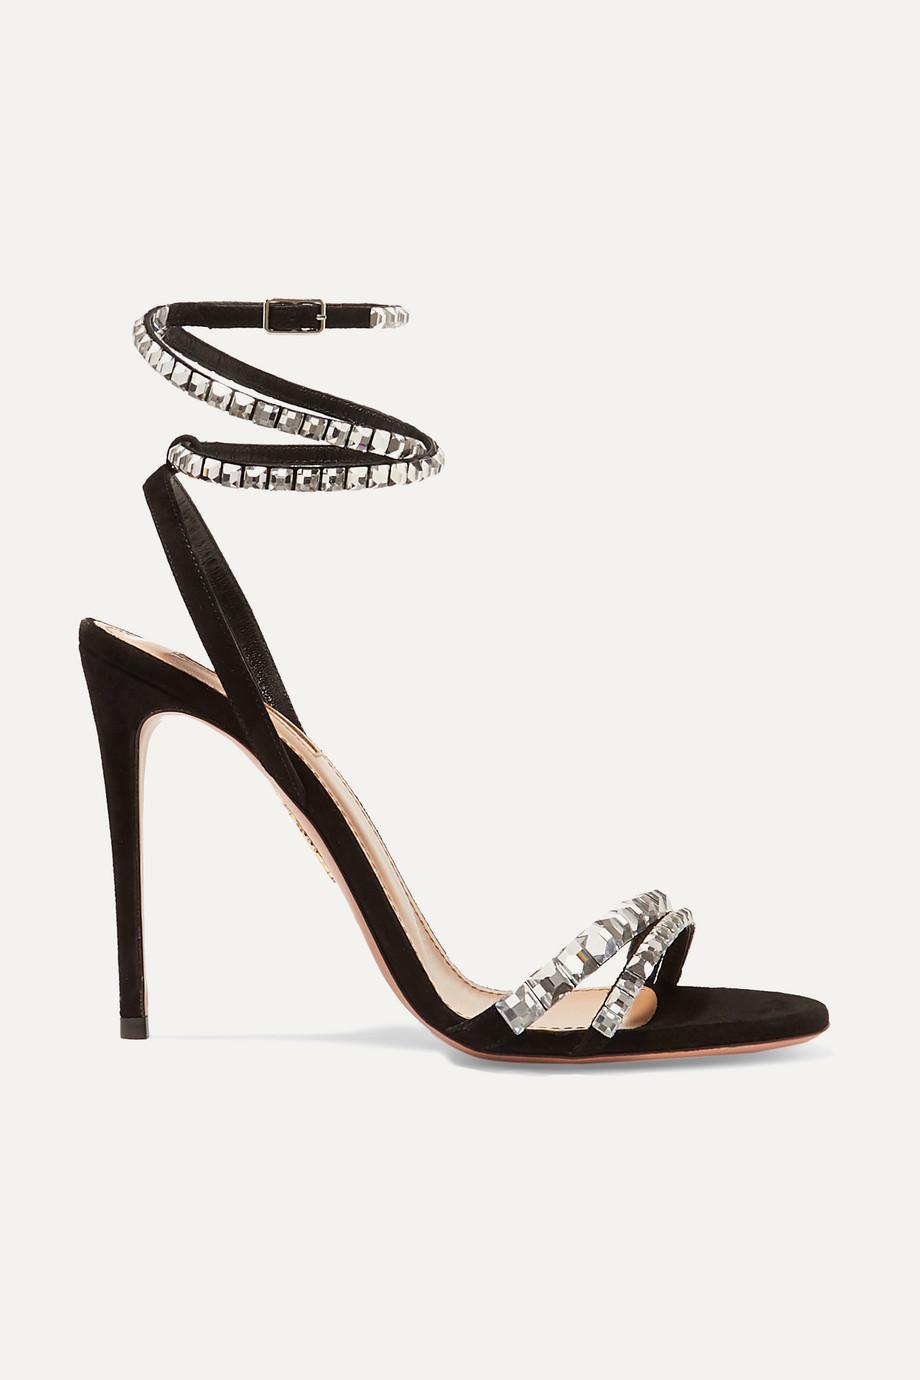 Aquazzura So Vera 105 crystal-embellished suede sandals